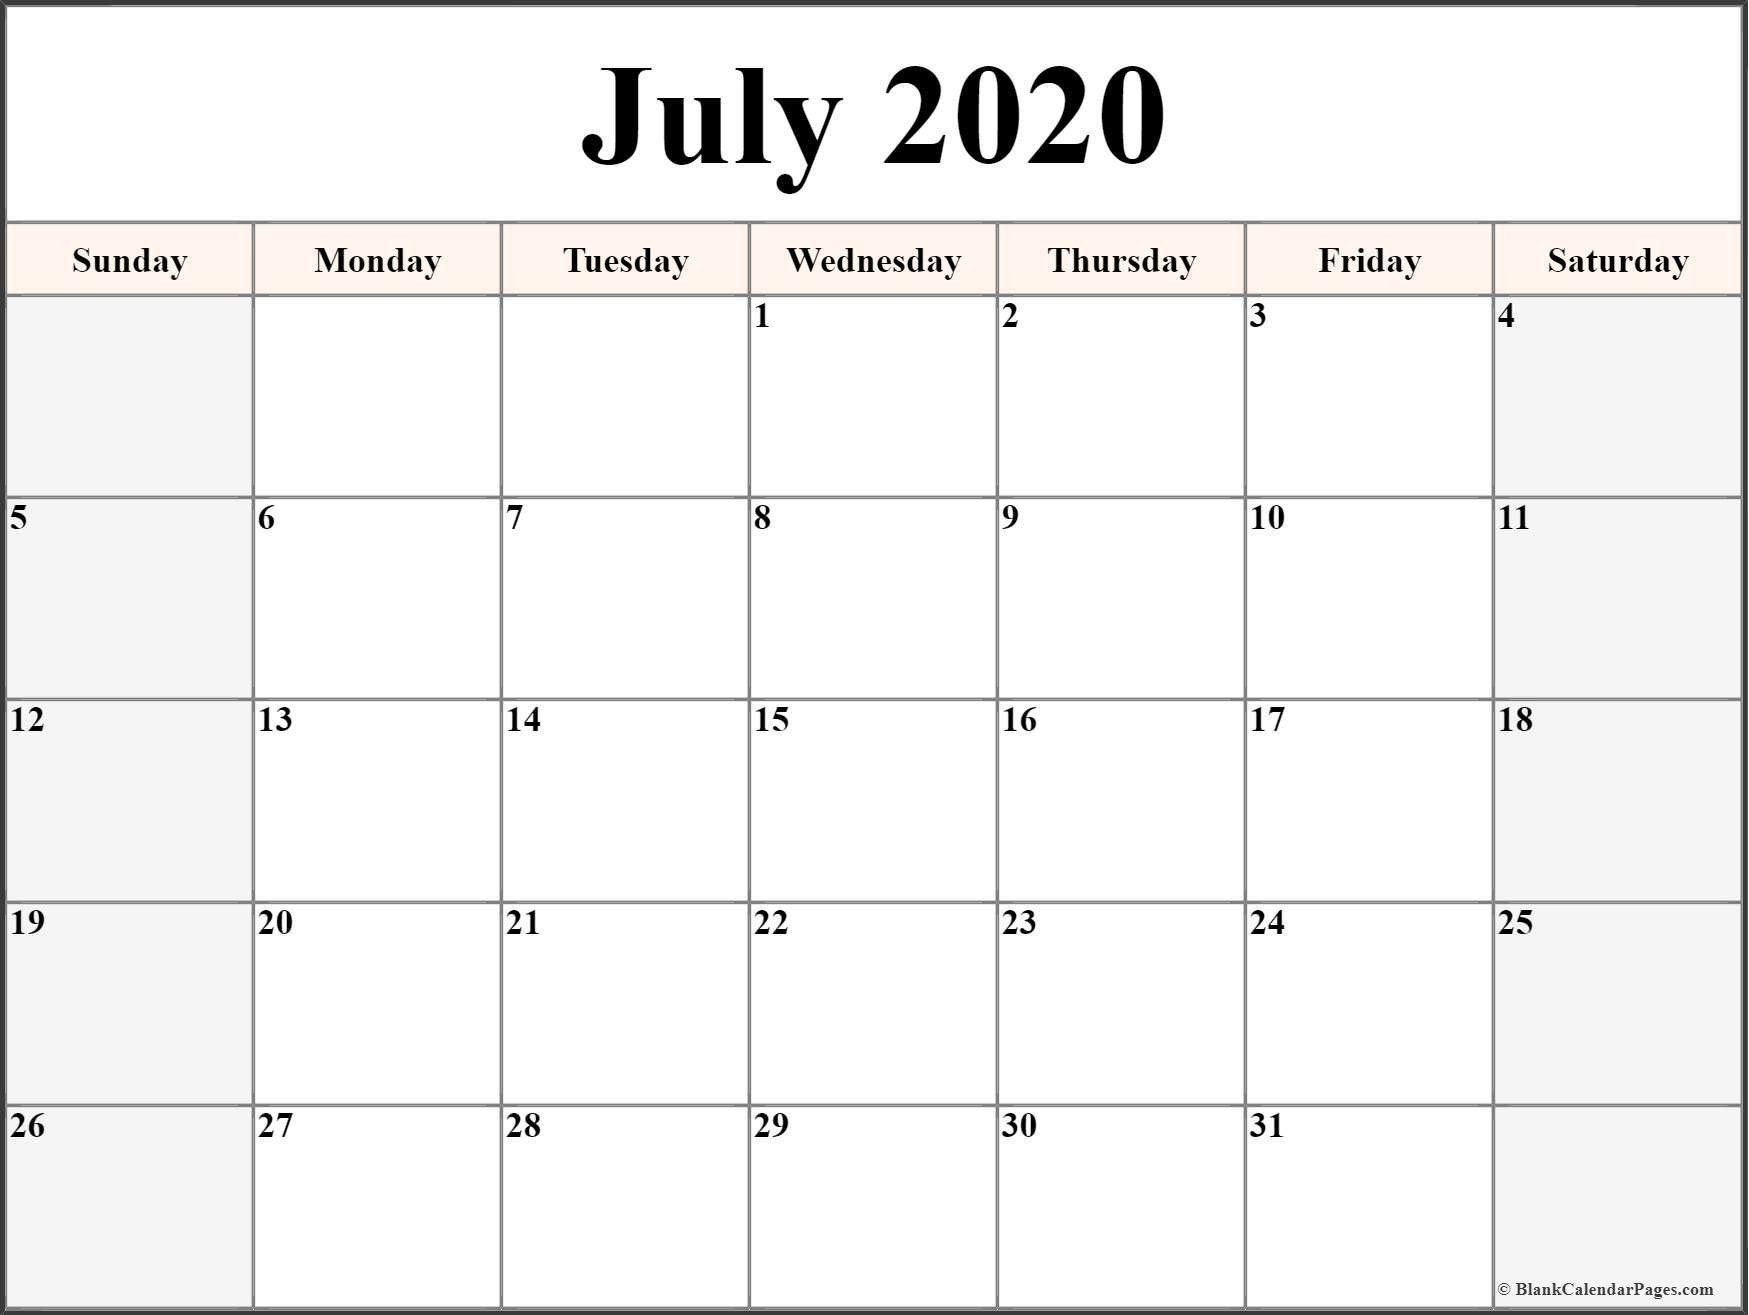 printable calendar templates 2020 in 2020 | printable